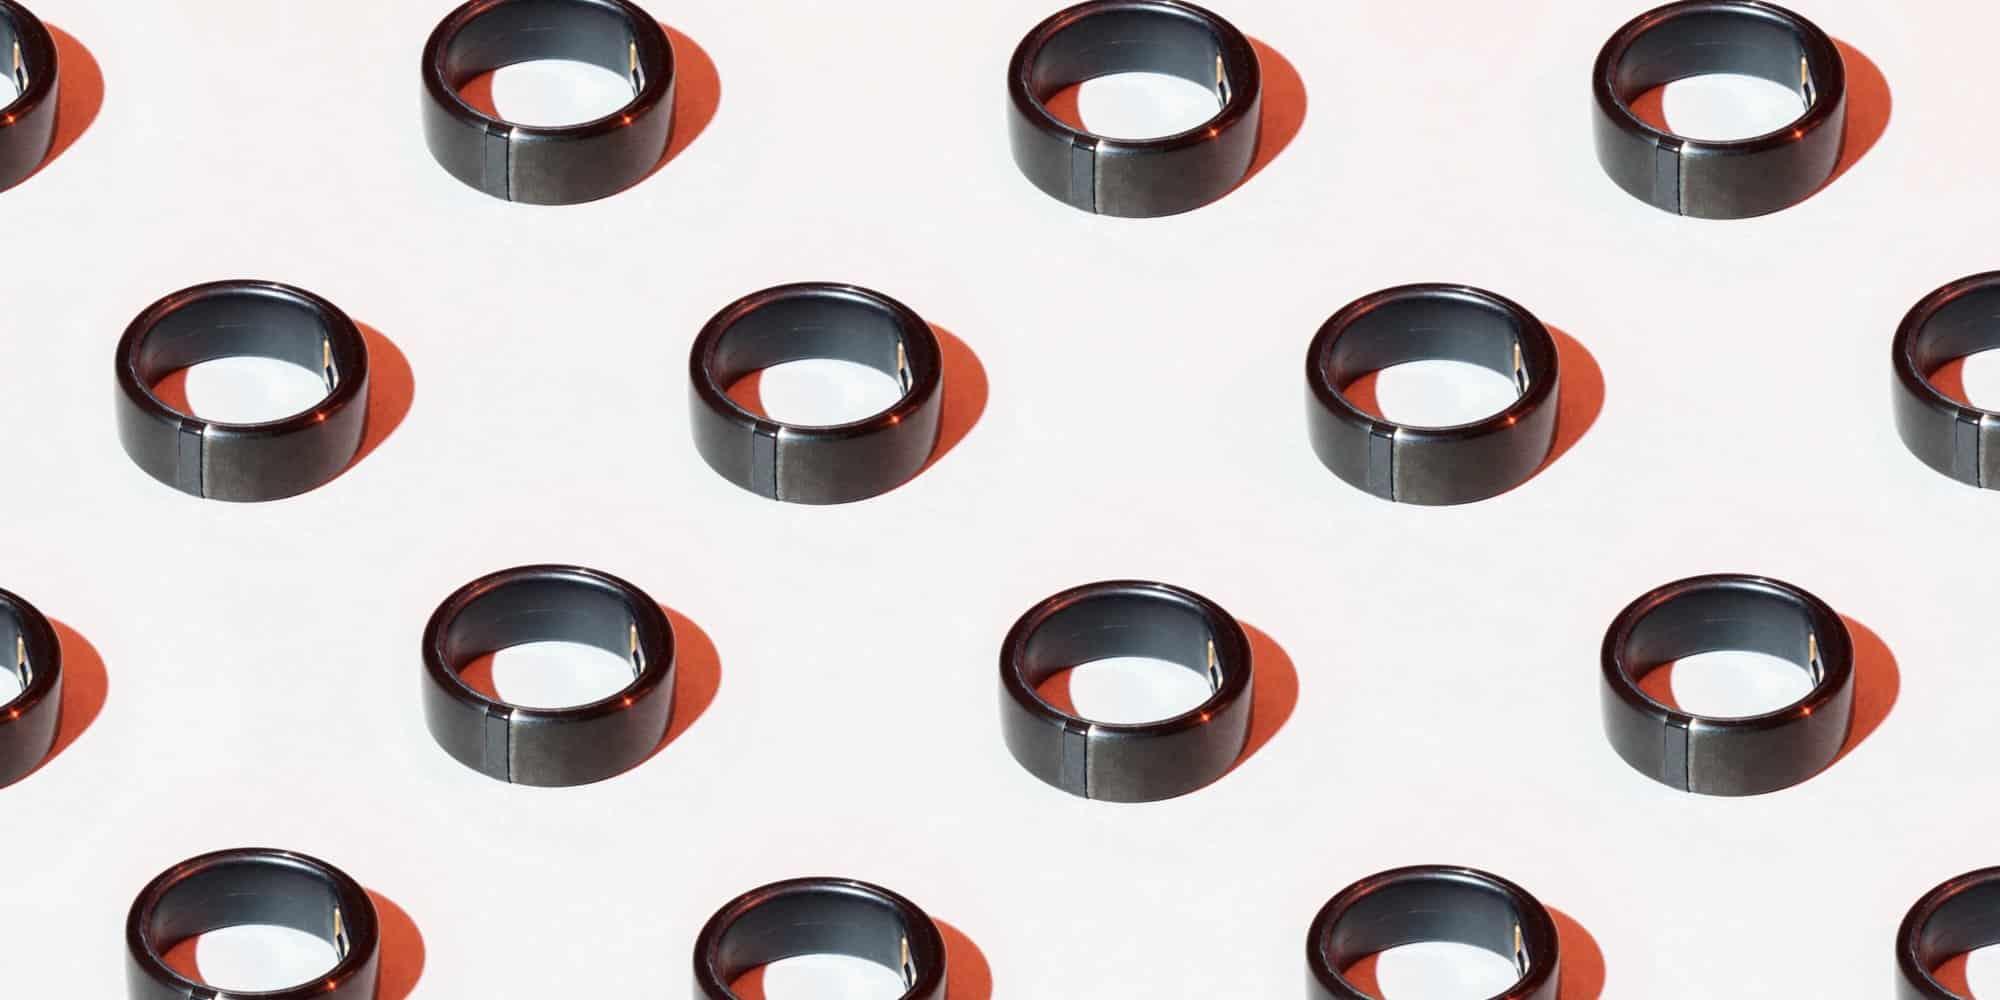 motiv ring vs oura ring – comparing the best smart rings for fitness